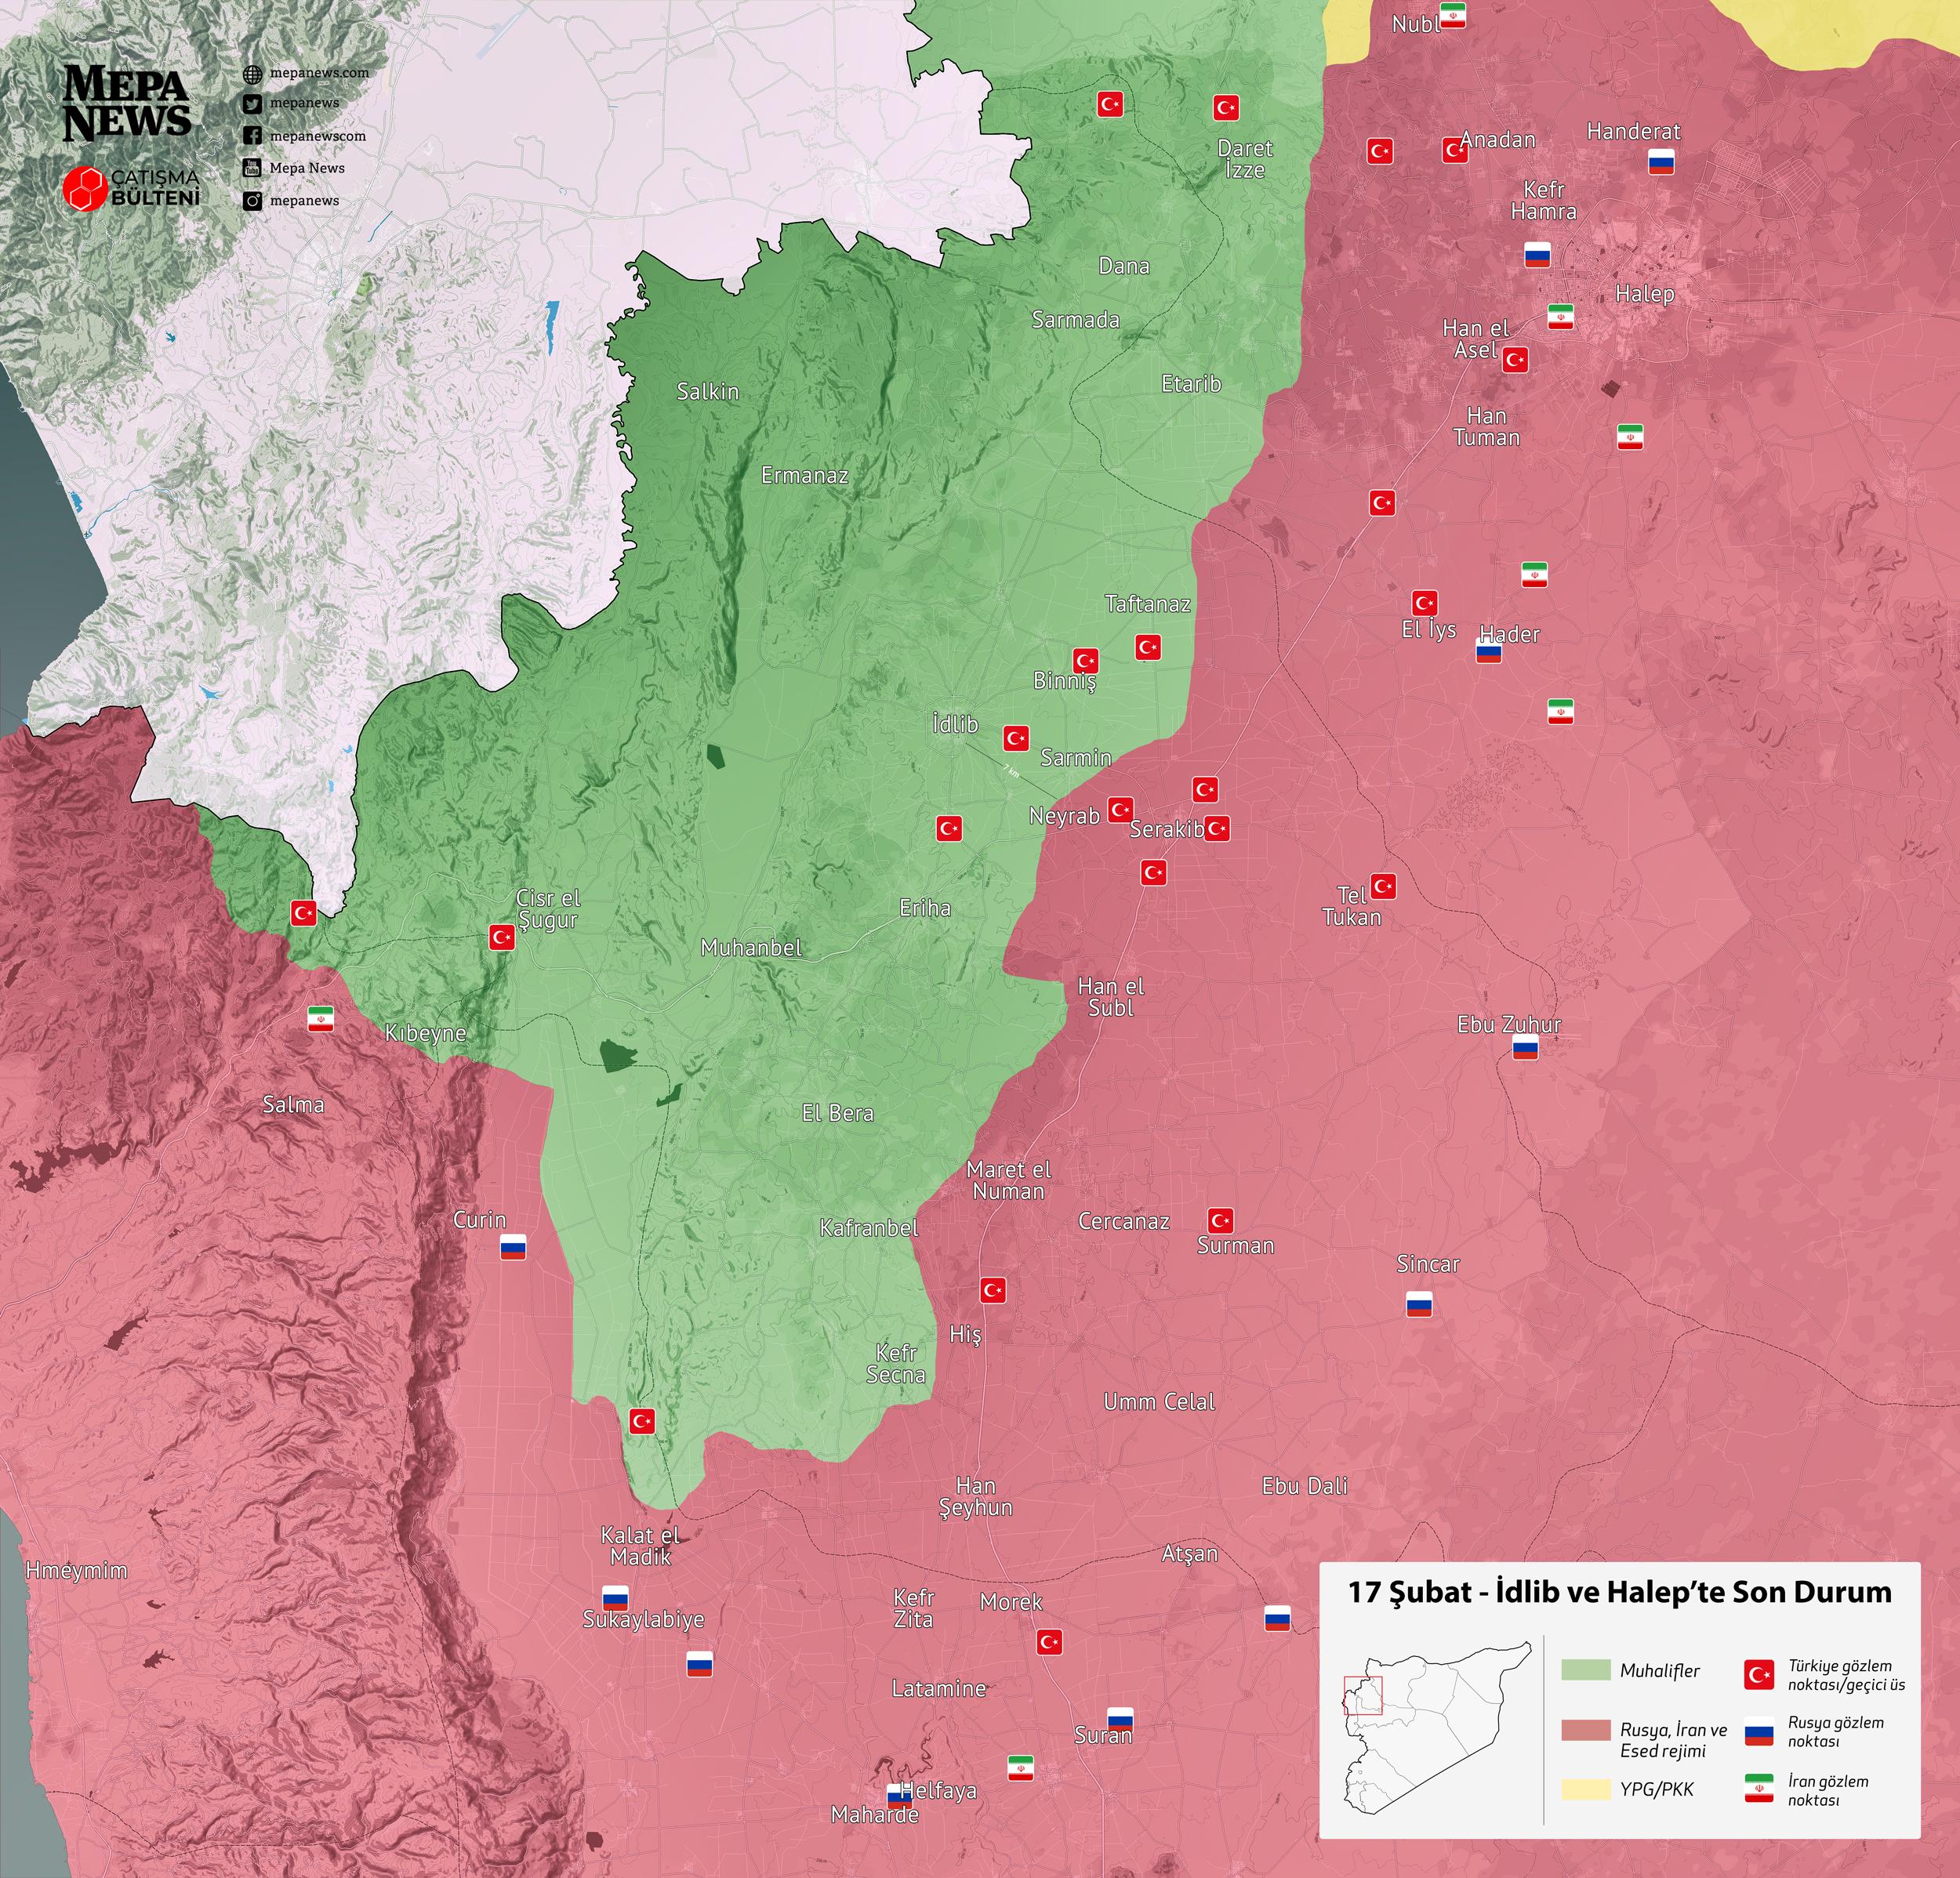 İdlib'de son durum (17 Şubat 2020)